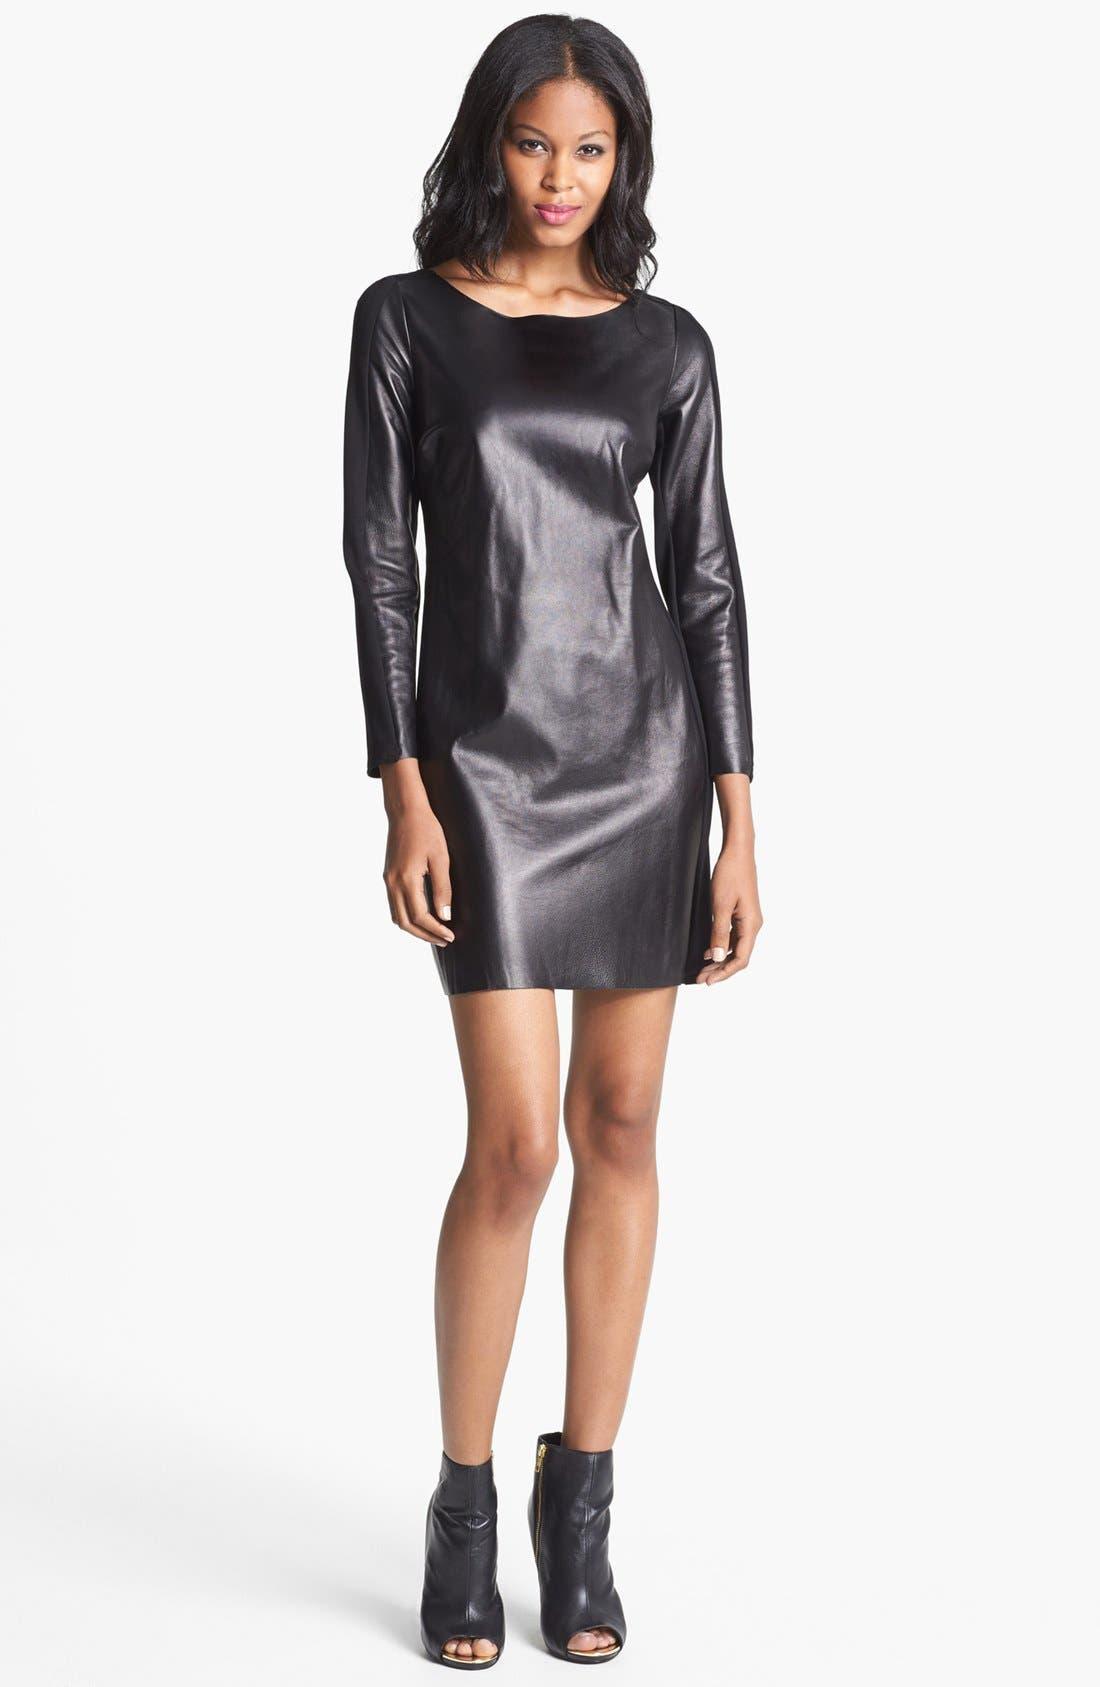 Main Image - ALICE & TRIXIE 'Lourdes' Leather & Ponte Knit Dress